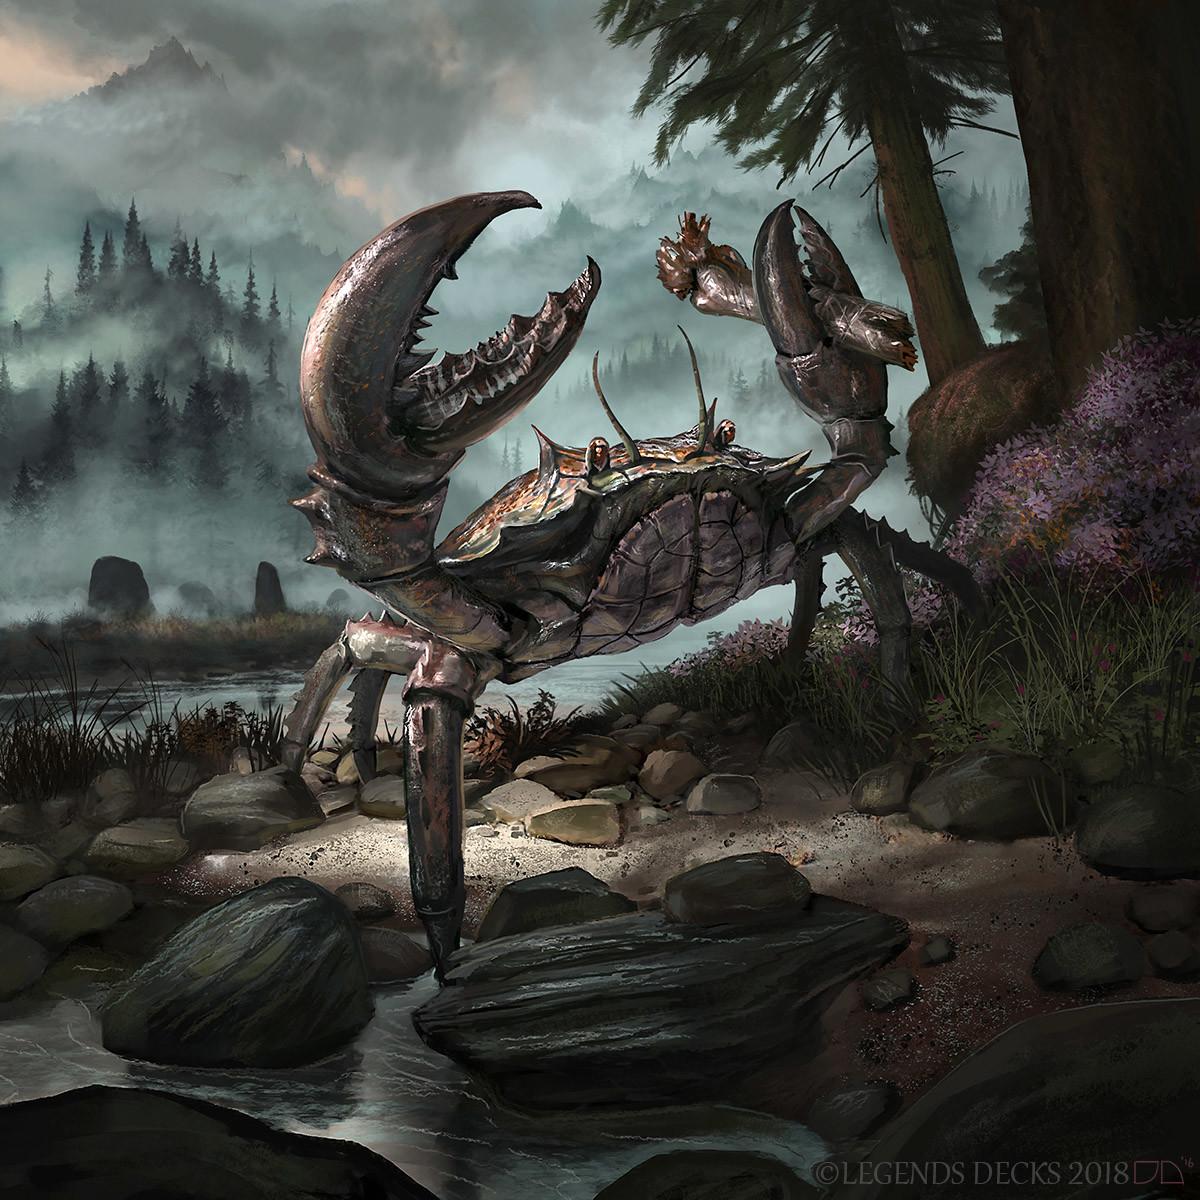 jeffrey-rex-lljr-tes-creature-mudcrab-anklesnapper-web.jpg